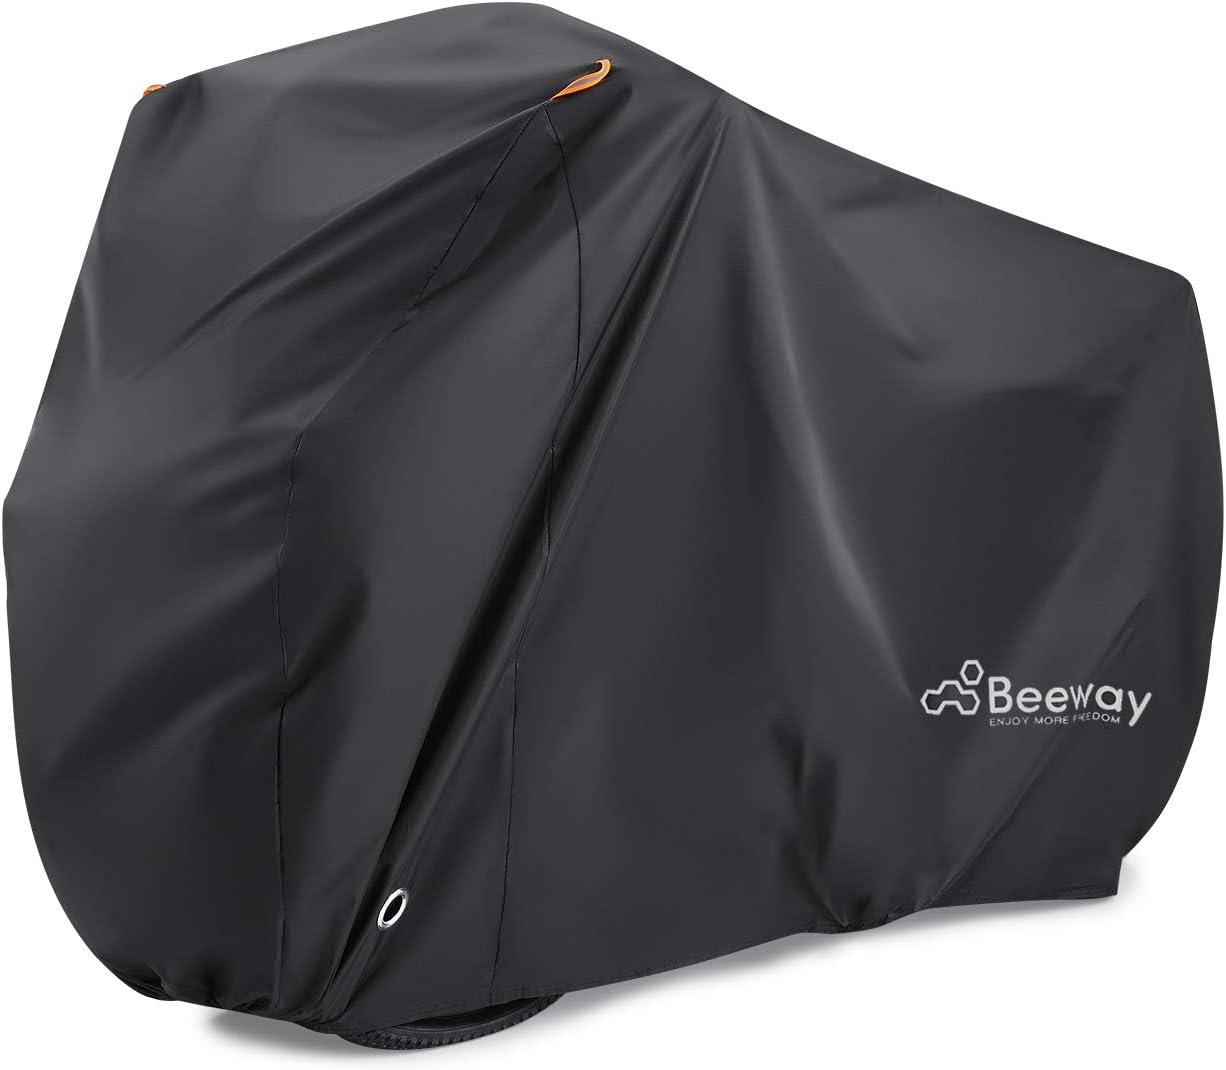 M 190T Waterproof Bicycle Bike Cover Outdoor Dust Anti UV Protector for 2 Bike